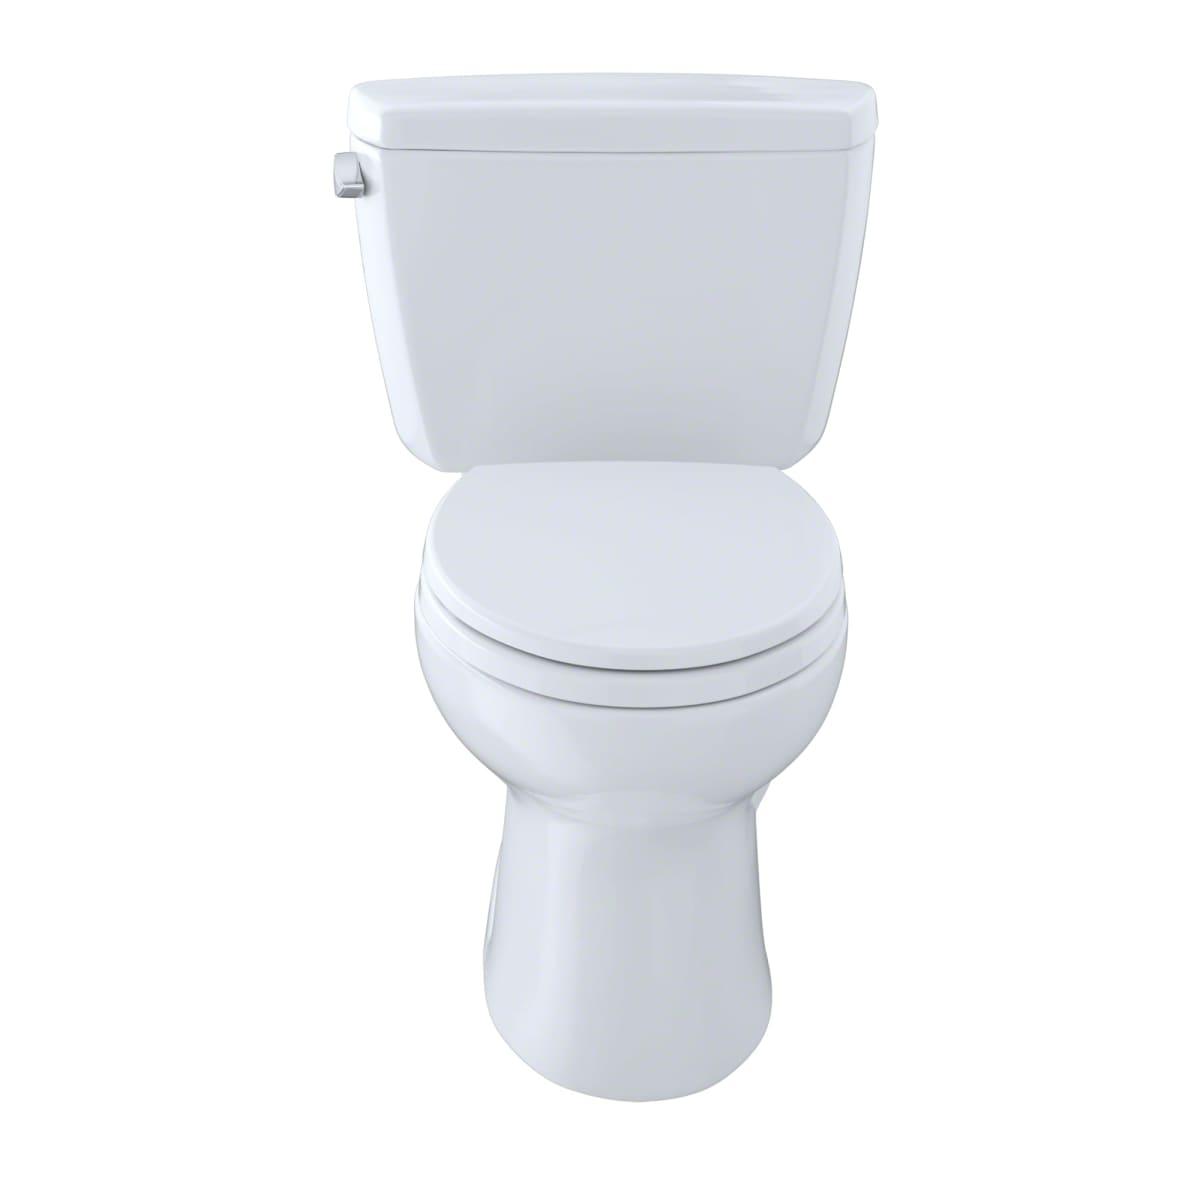 Toto CST744SF.10#01 Cotton Drake 1.6 GPF Two Piece Elongated Toilet ...